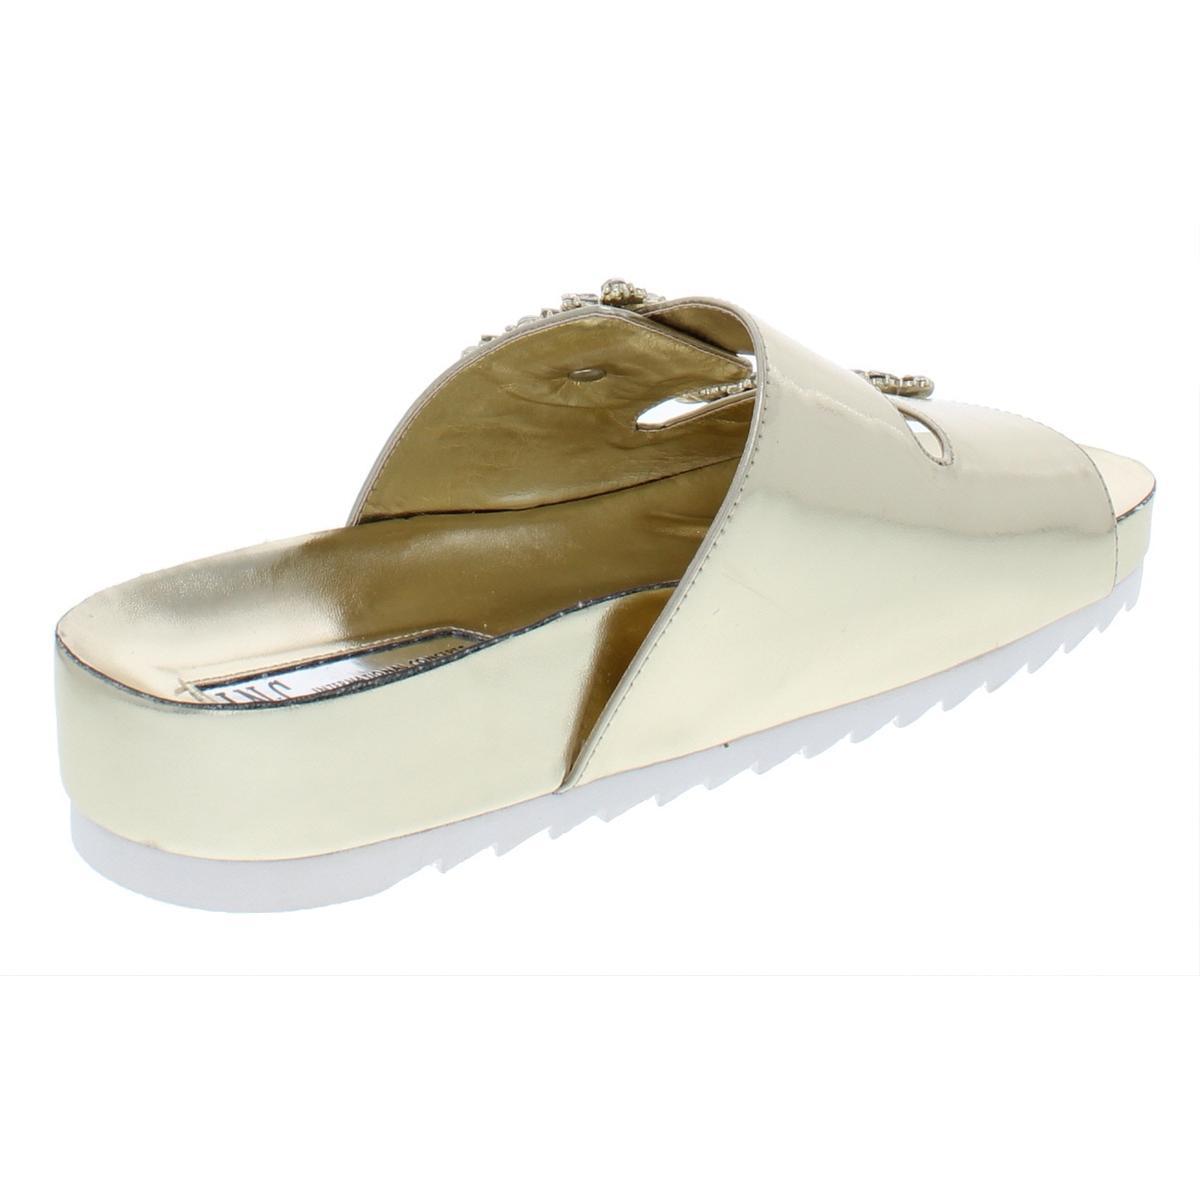 INC-Womens-Alani-Embellished-Metallic-Flat-Sandals-Shoes-BHFO-6405 thumbnail 6